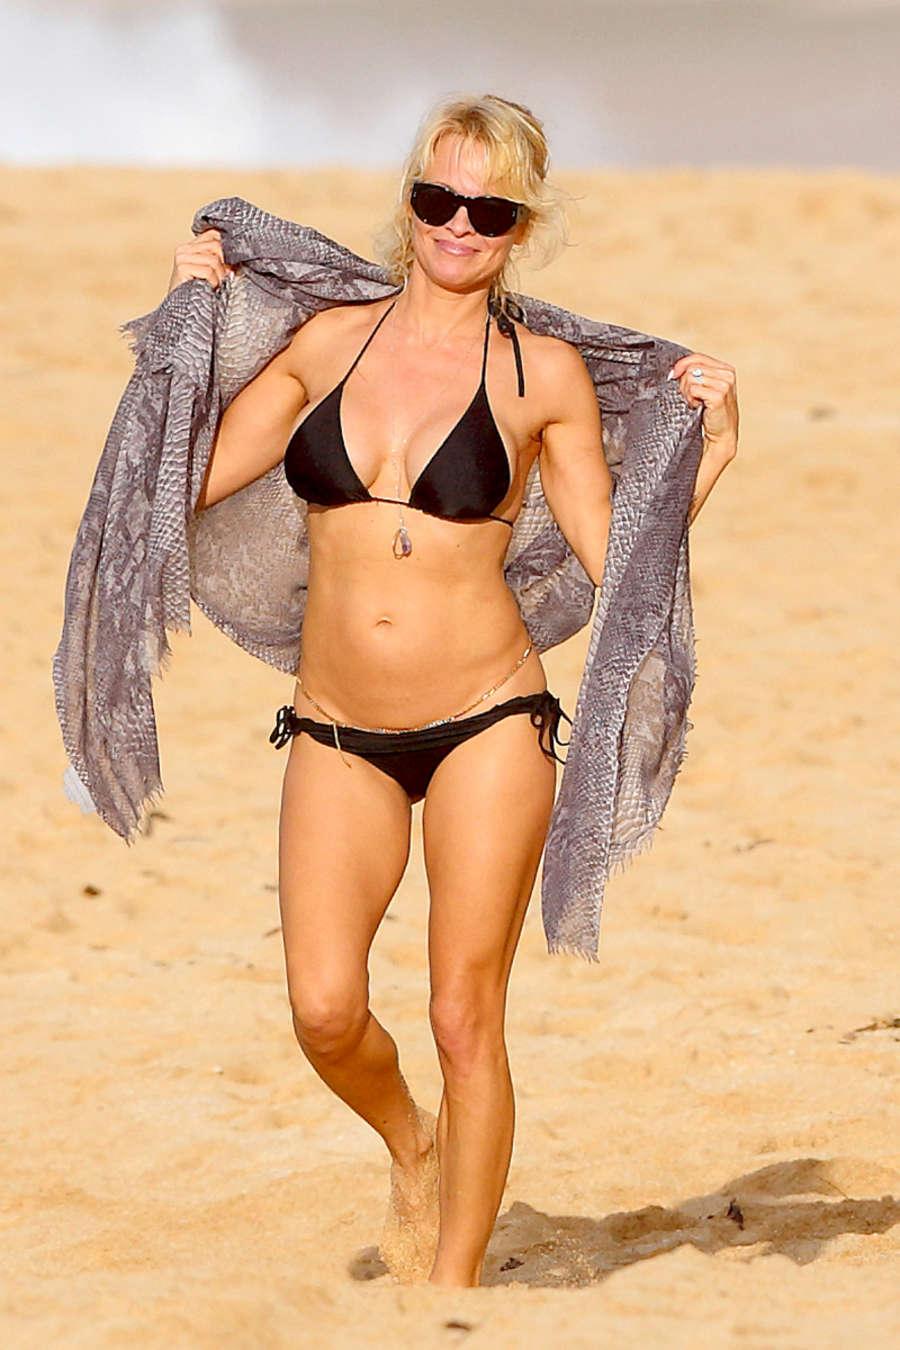 Selfie Bikini Pamela Anderson naked photo 2017